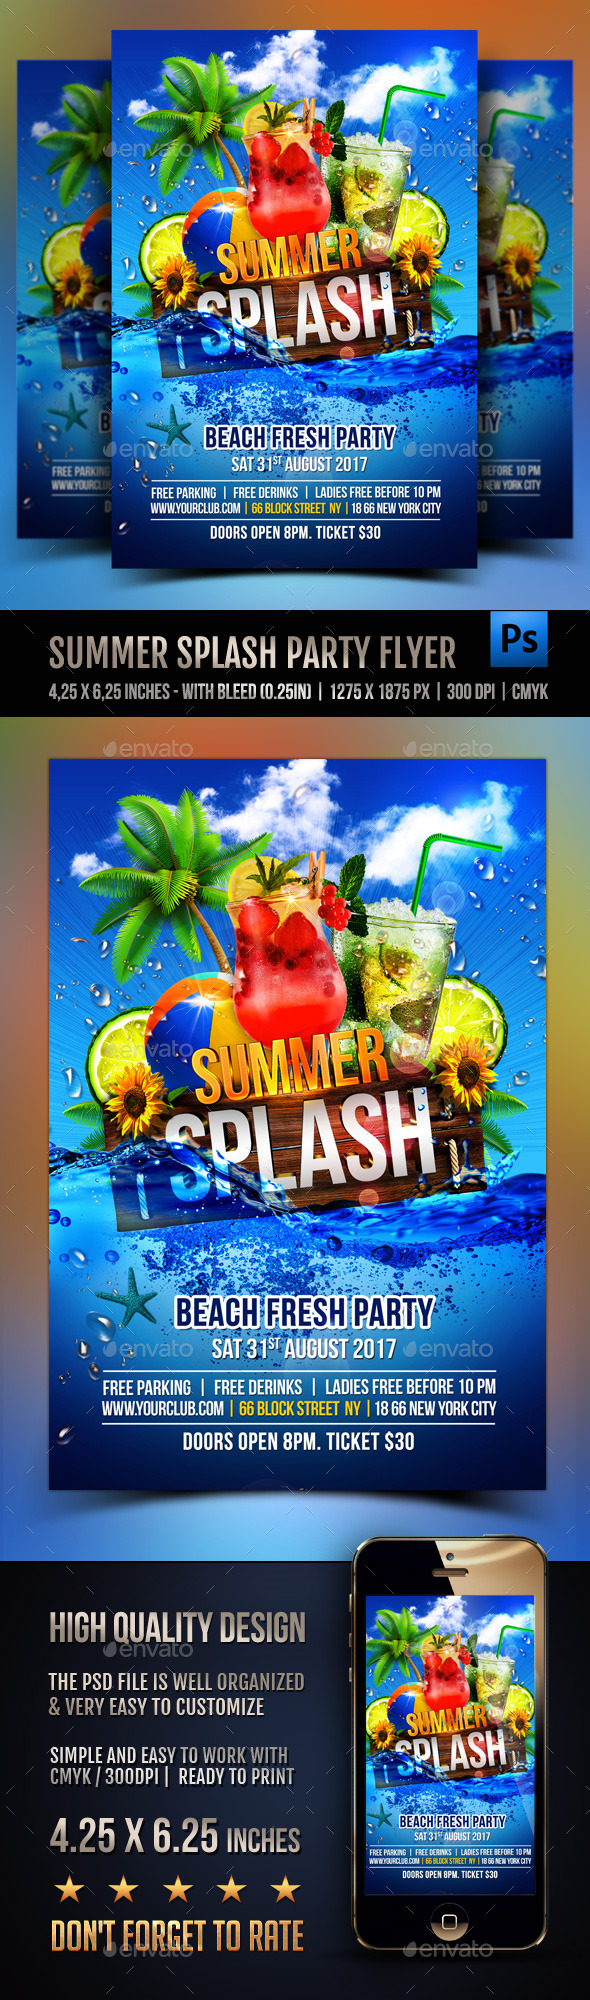 GraphicRiver Summer Splash Cocktails Party Flyer 11948961